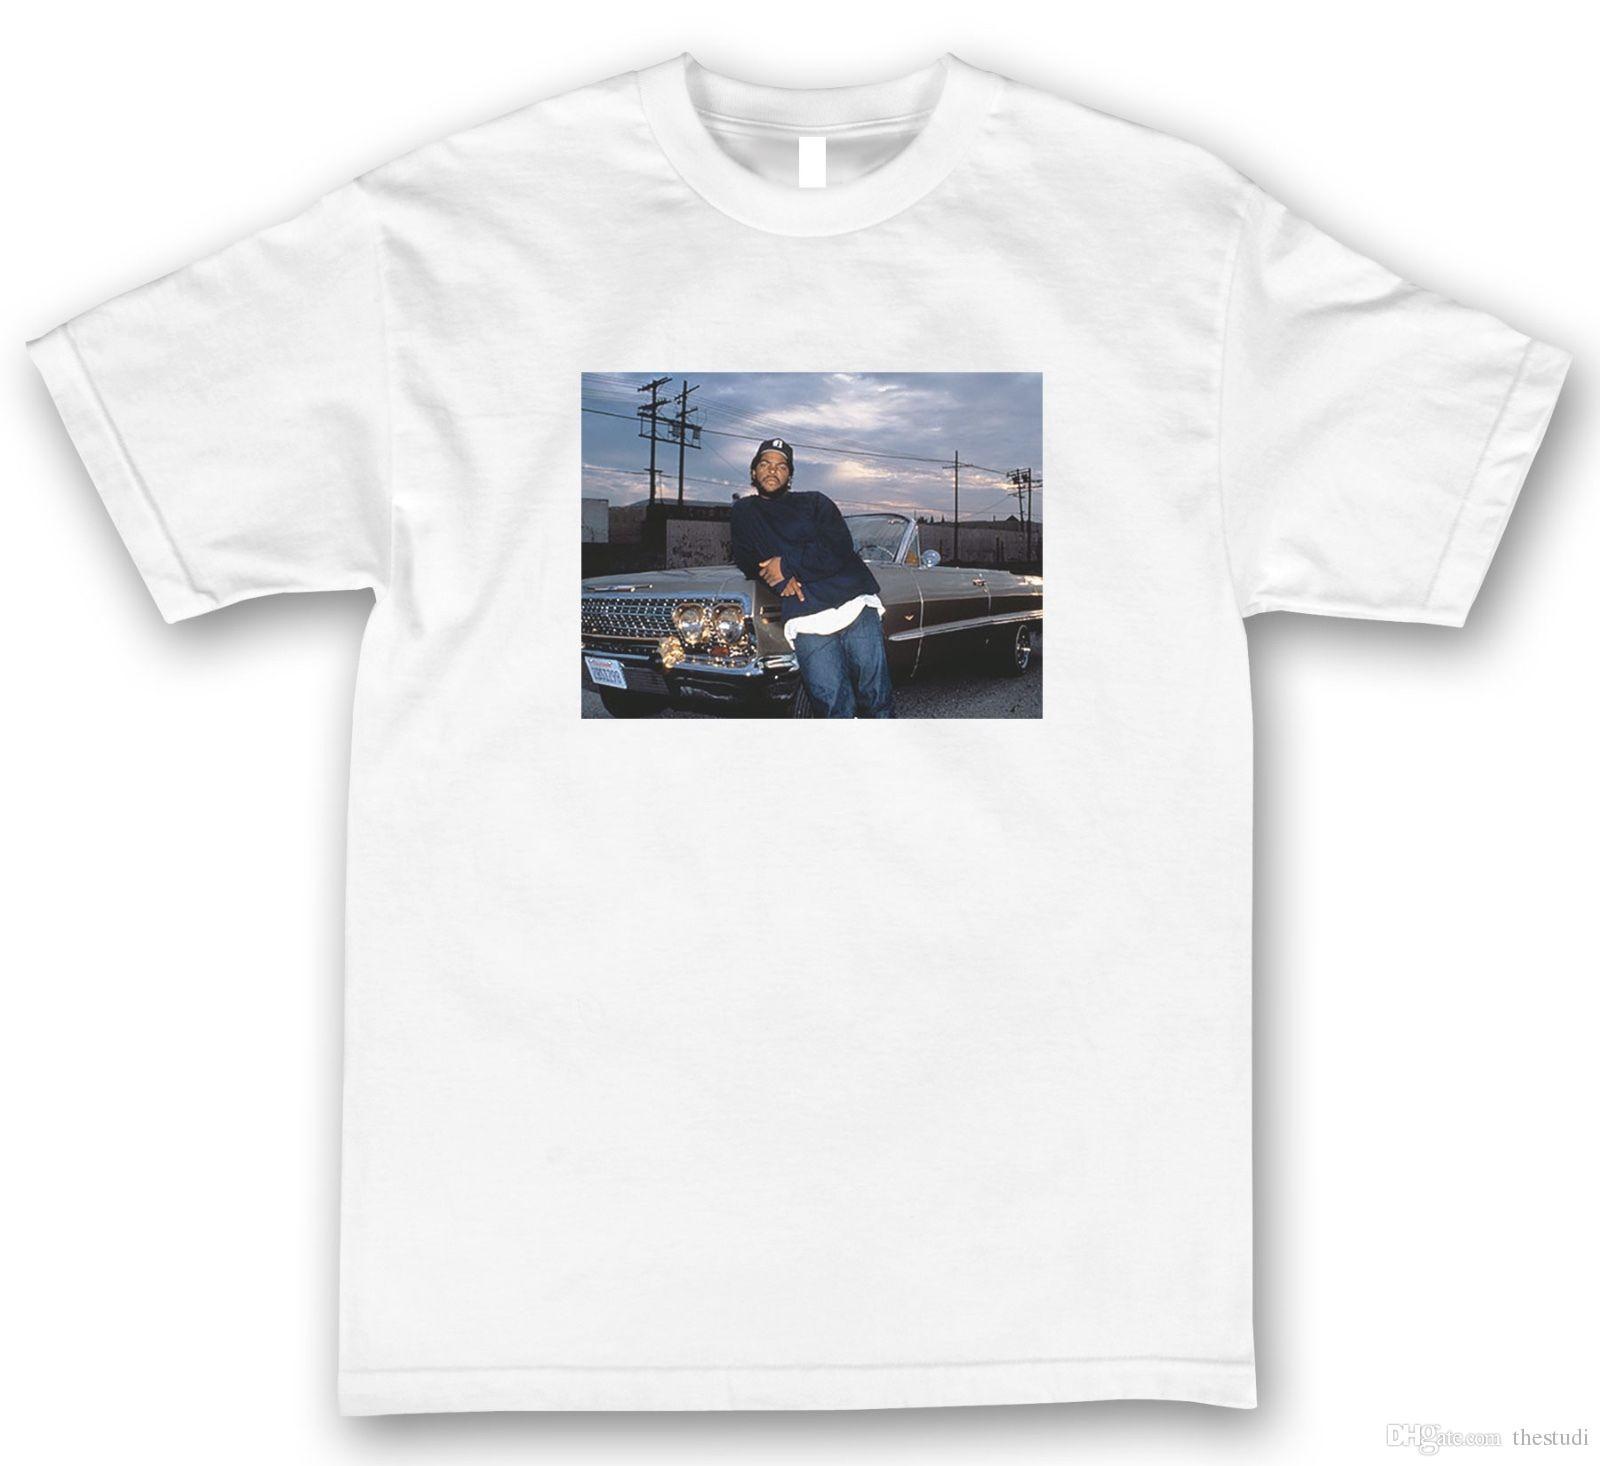 4c0d6b4e2 DOUGHBOY BOYZ N THE HOOD T SHIRT IN WHITE NWA ICE CUBE 90'S MOVIES NEW SZ S  3XL Cool T Shirt Buy Shirts Online From Thestudi, $10.73  DHgate.Com